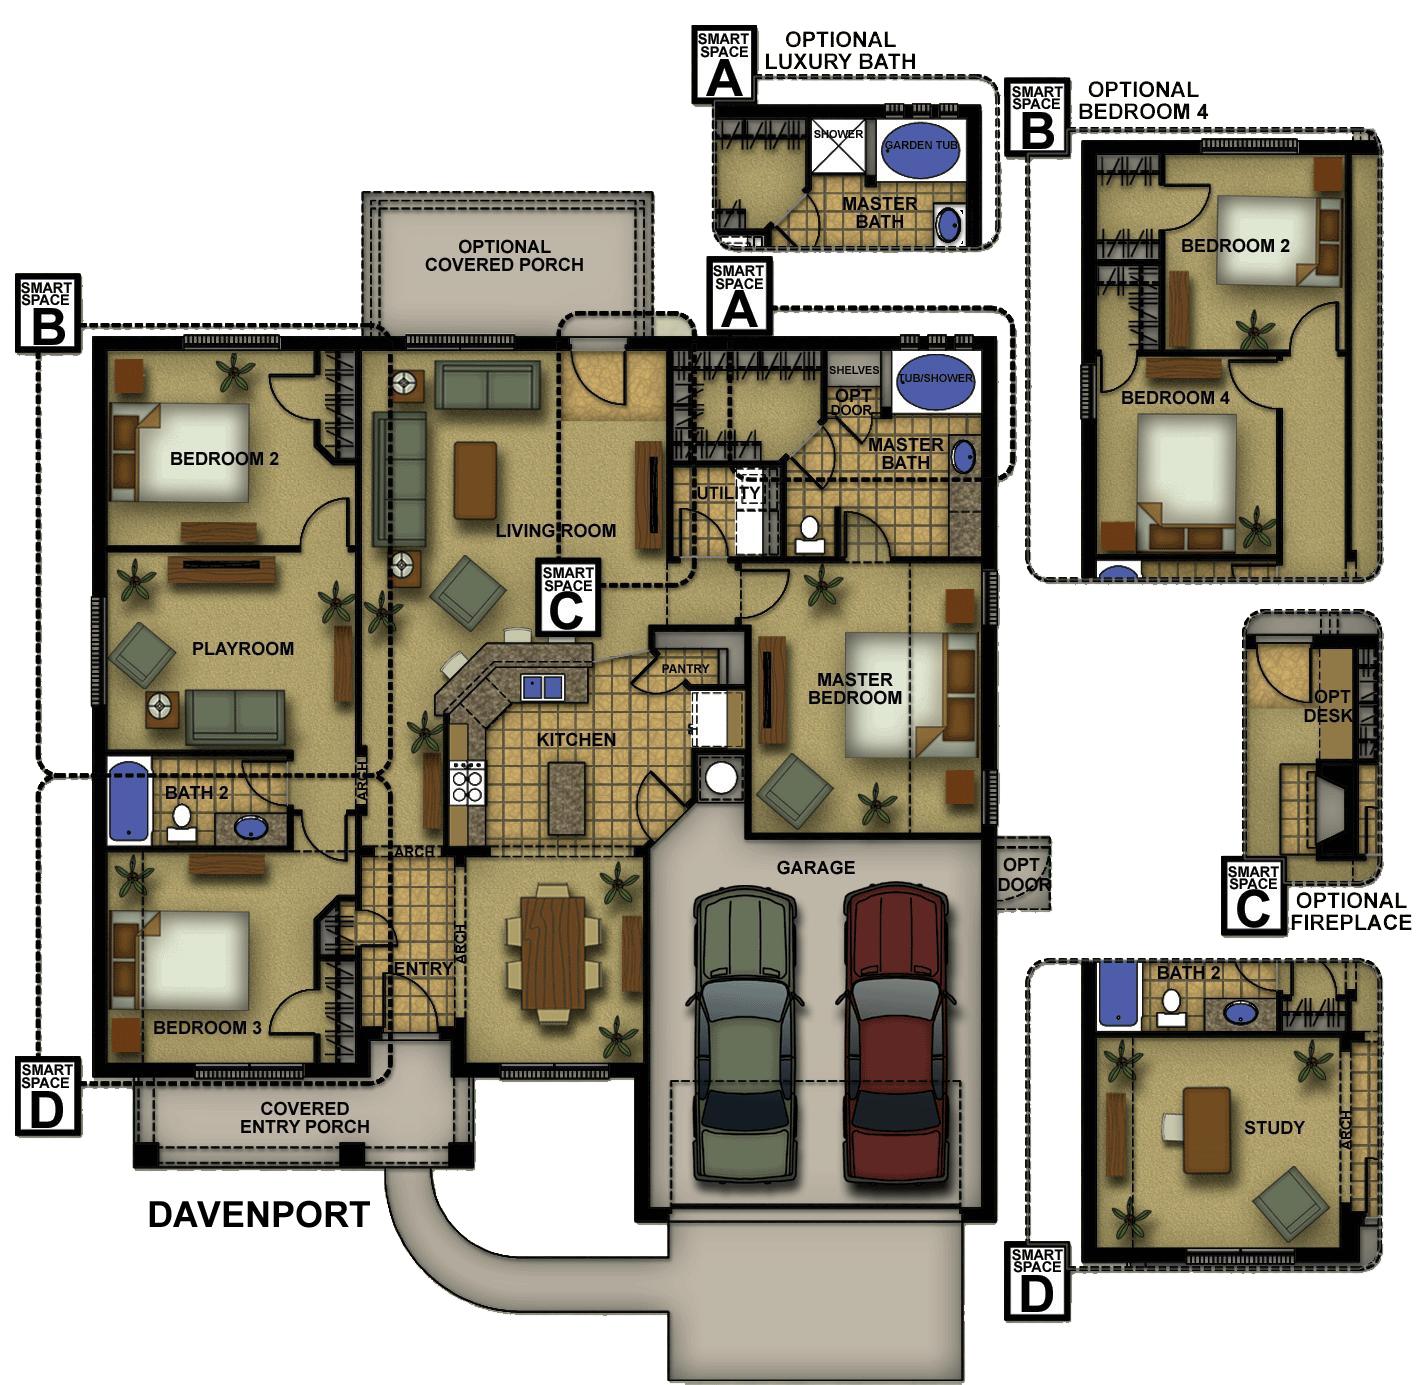 Davenport-II Floorplan